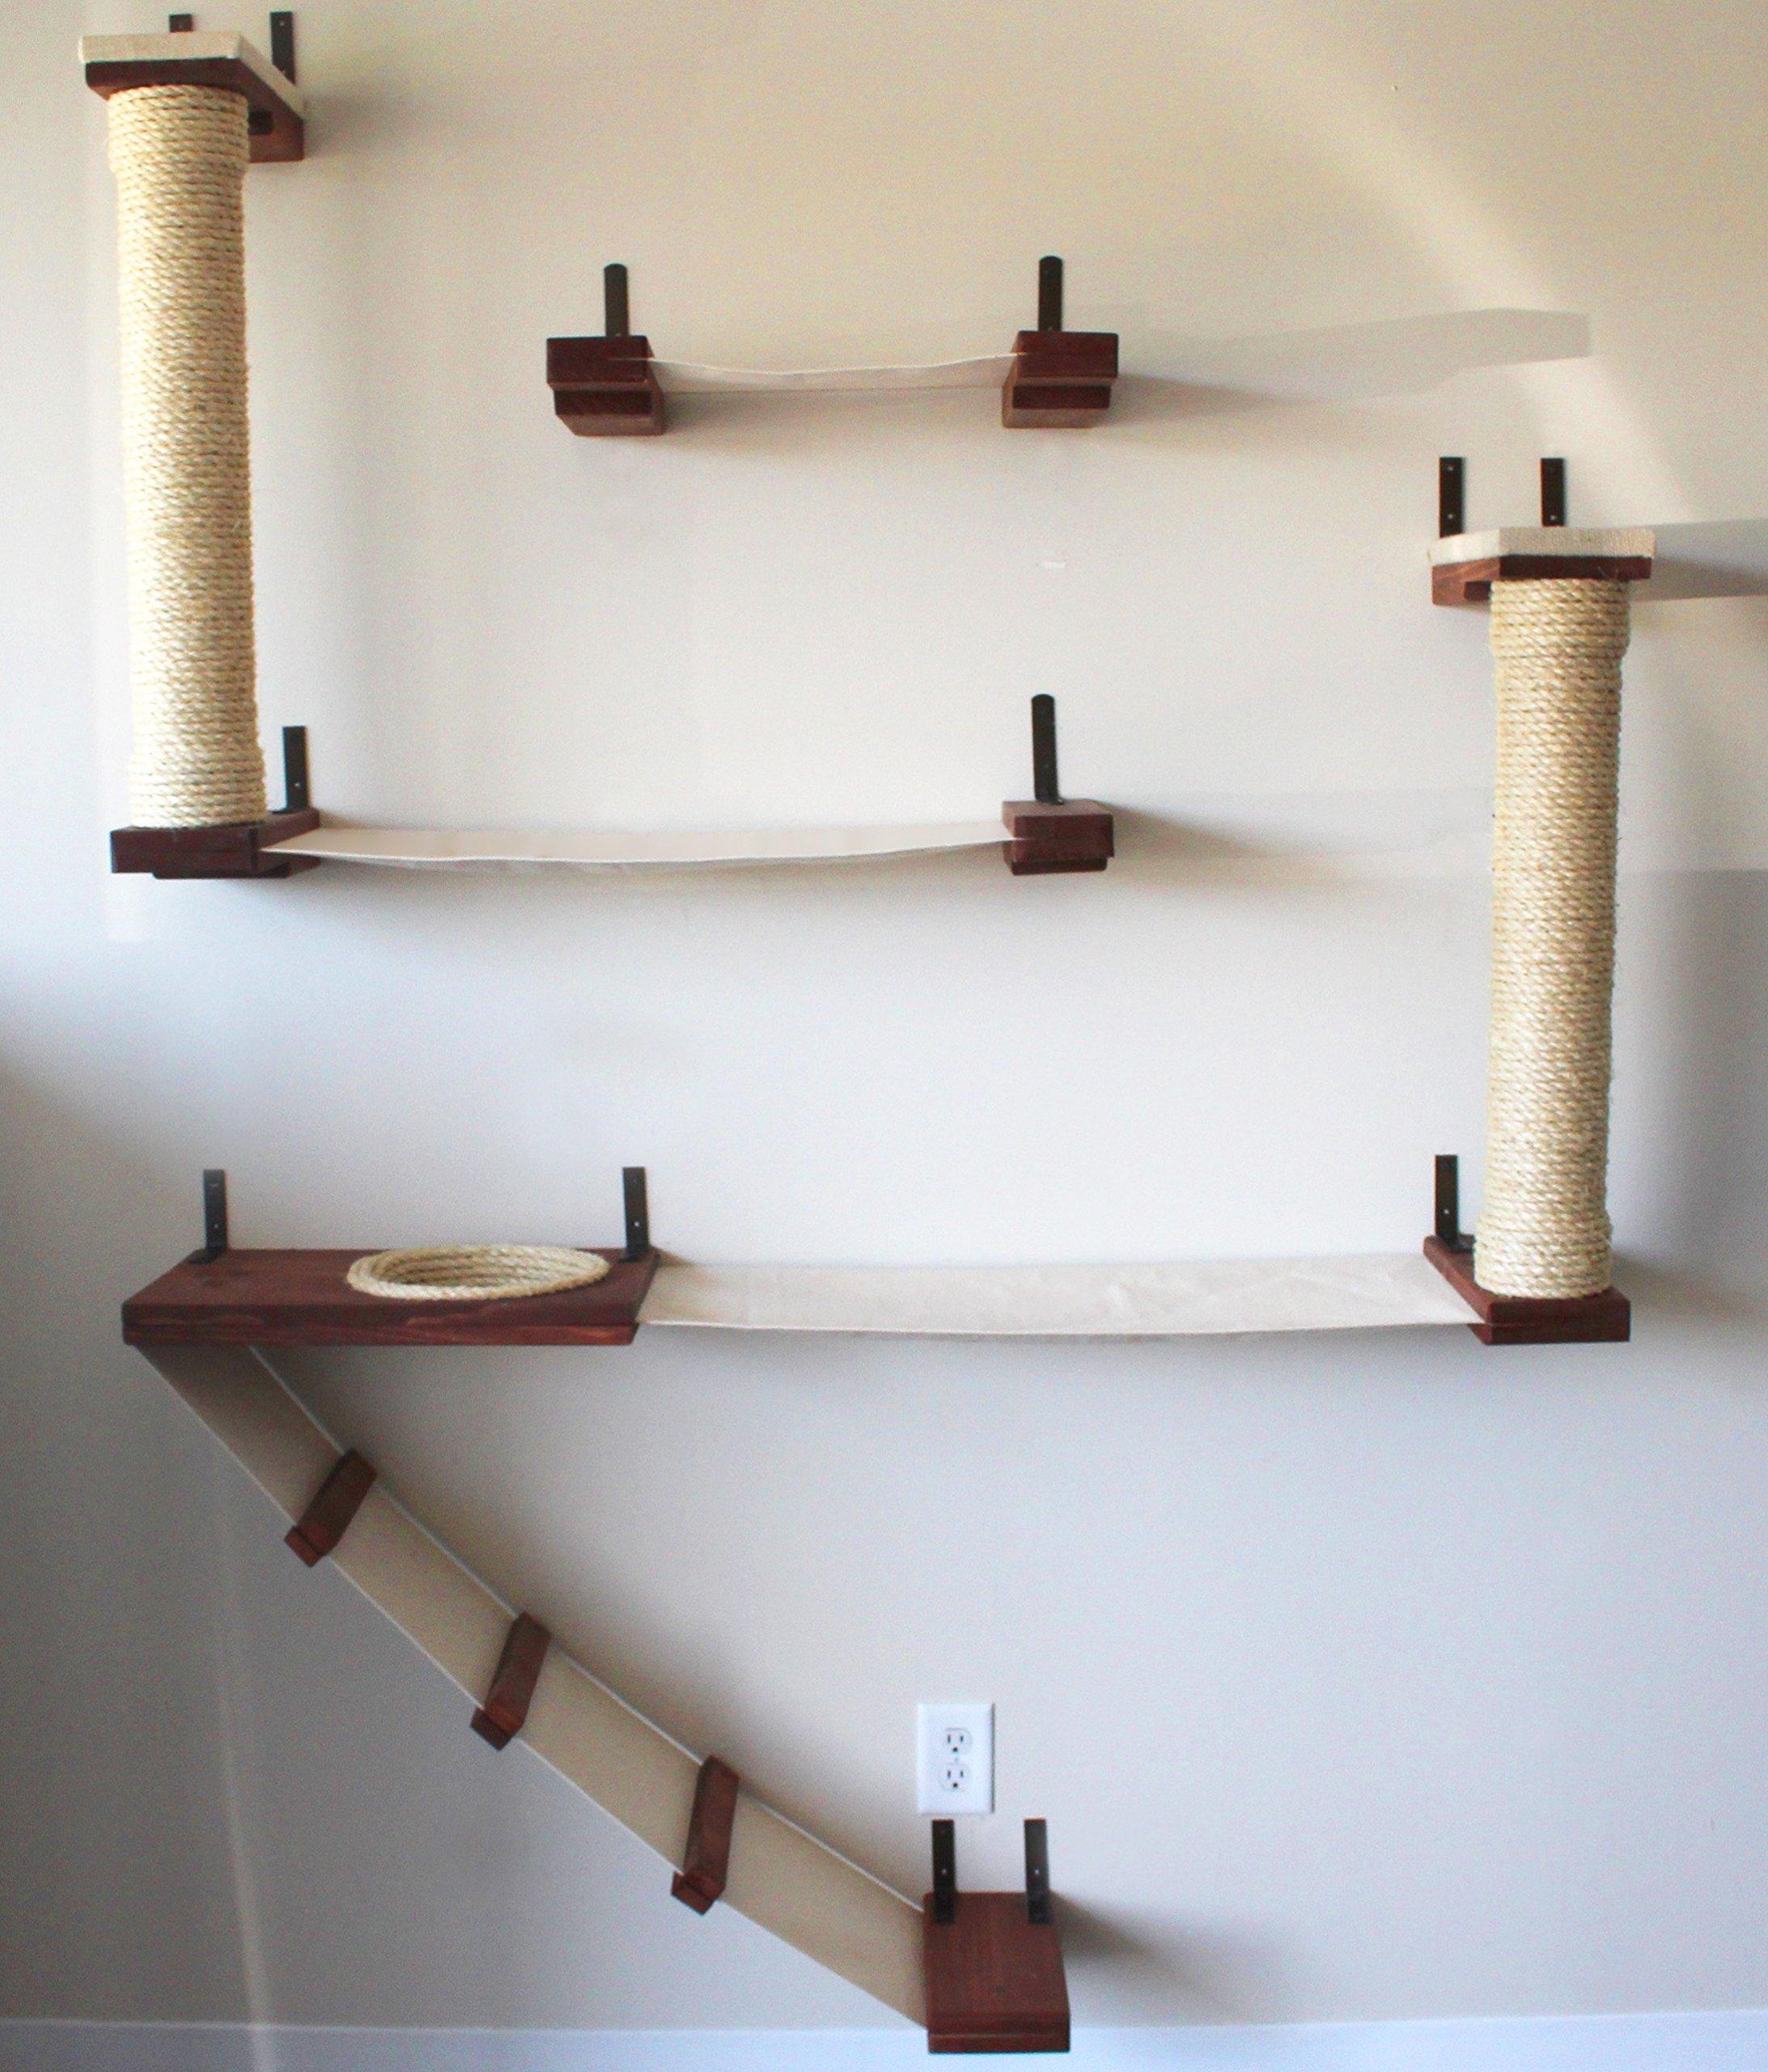 CatastrophiCreations The Roman Cat Fort Hammock Climbing Activity Wall-Mounted Cat Tree, English Chestnut